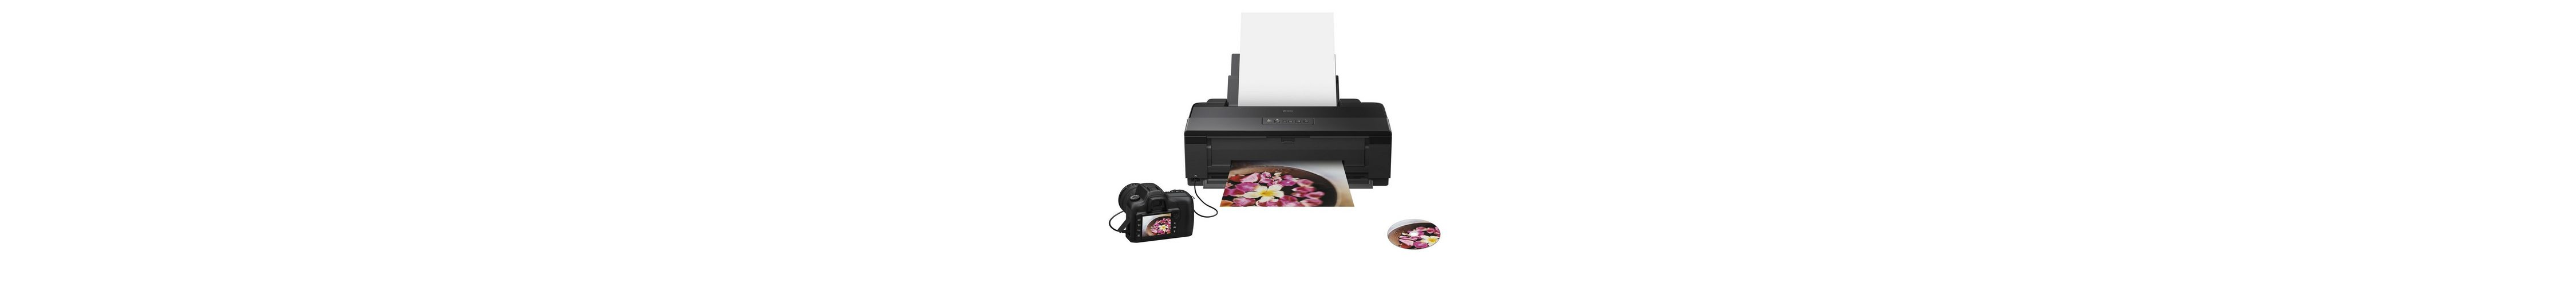 Epson Photo-Drucker »Stylus Photo 1500W (C11CB53302)«